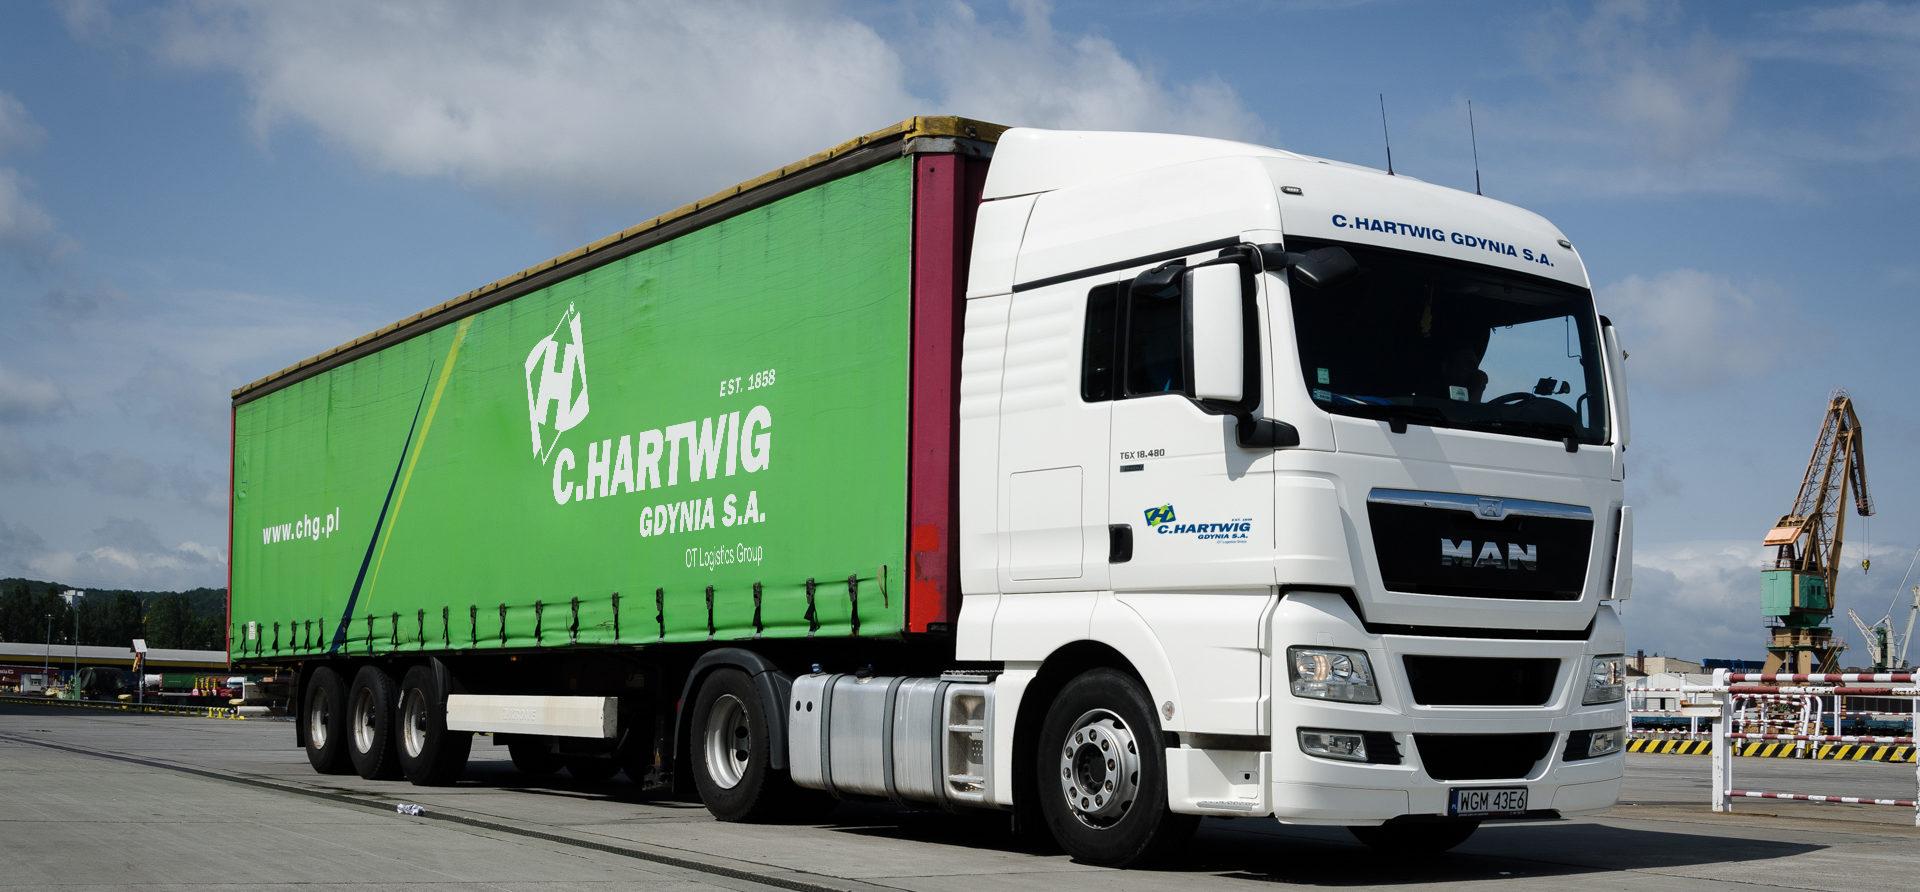 C. Hartwig Gdynia takes over SeaLand Logistics